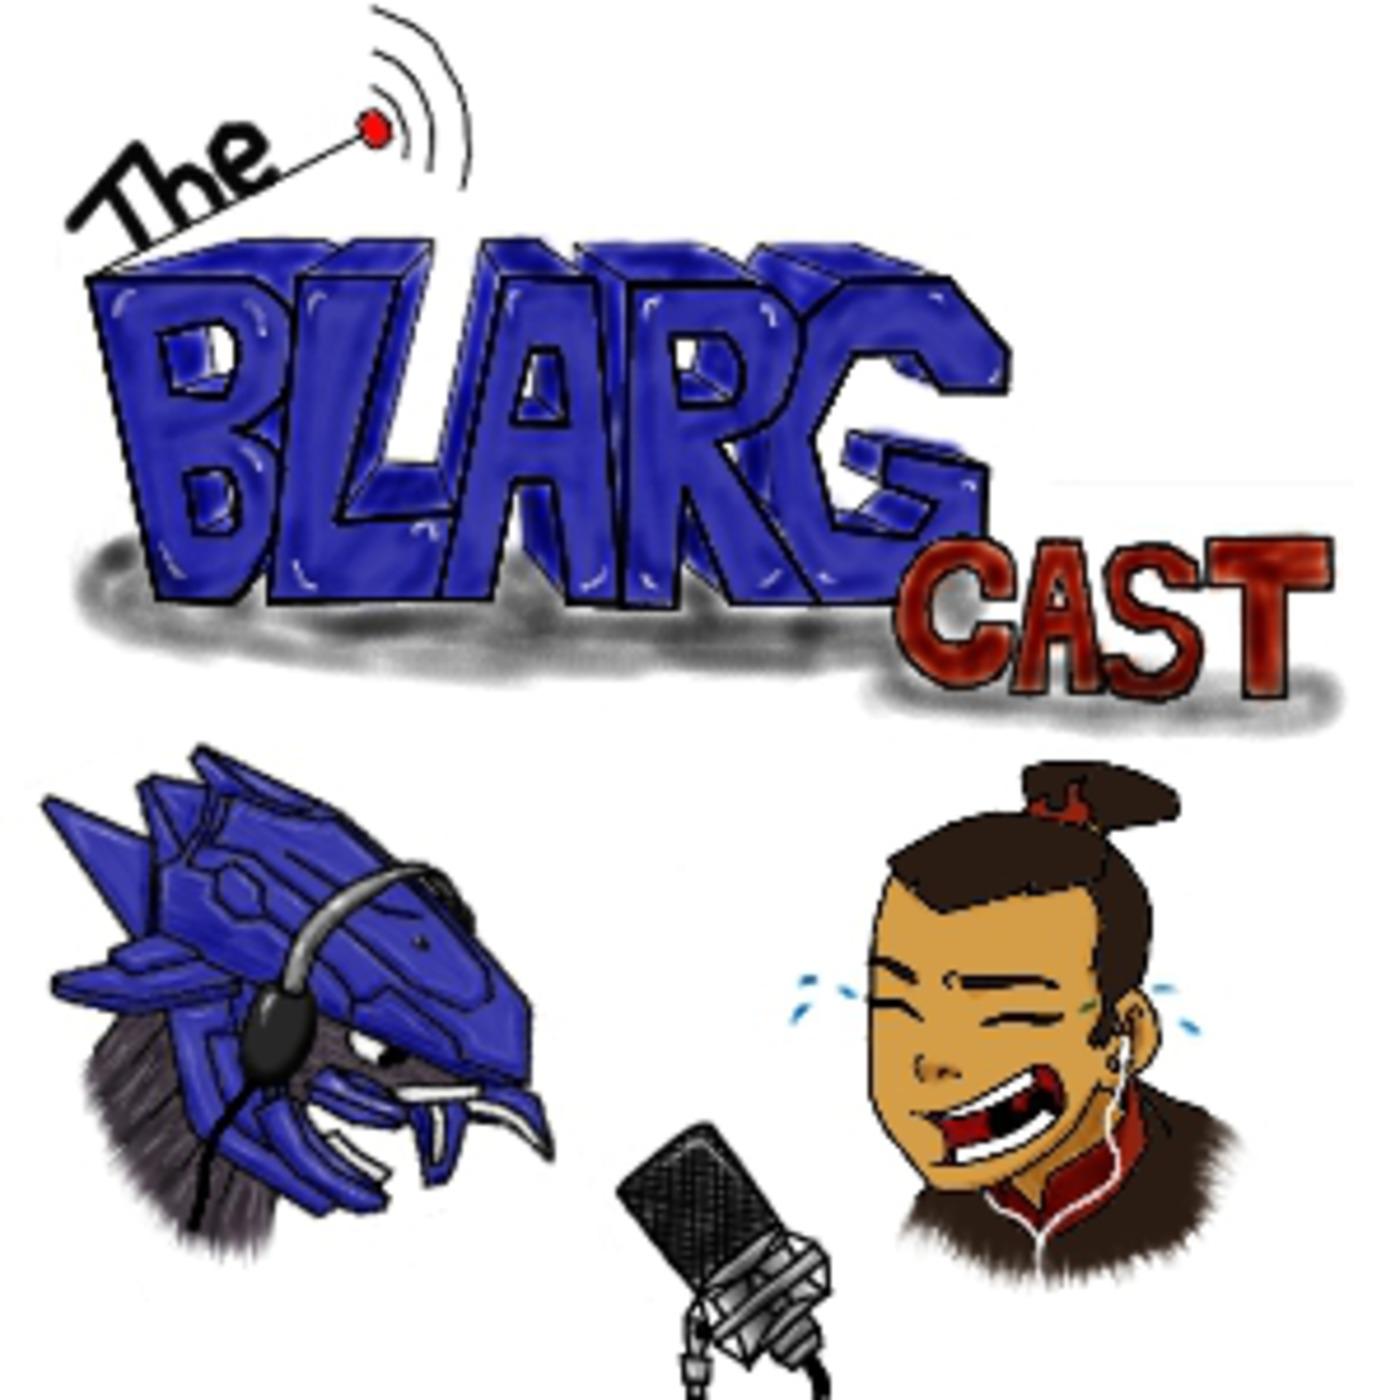 The Blargcast